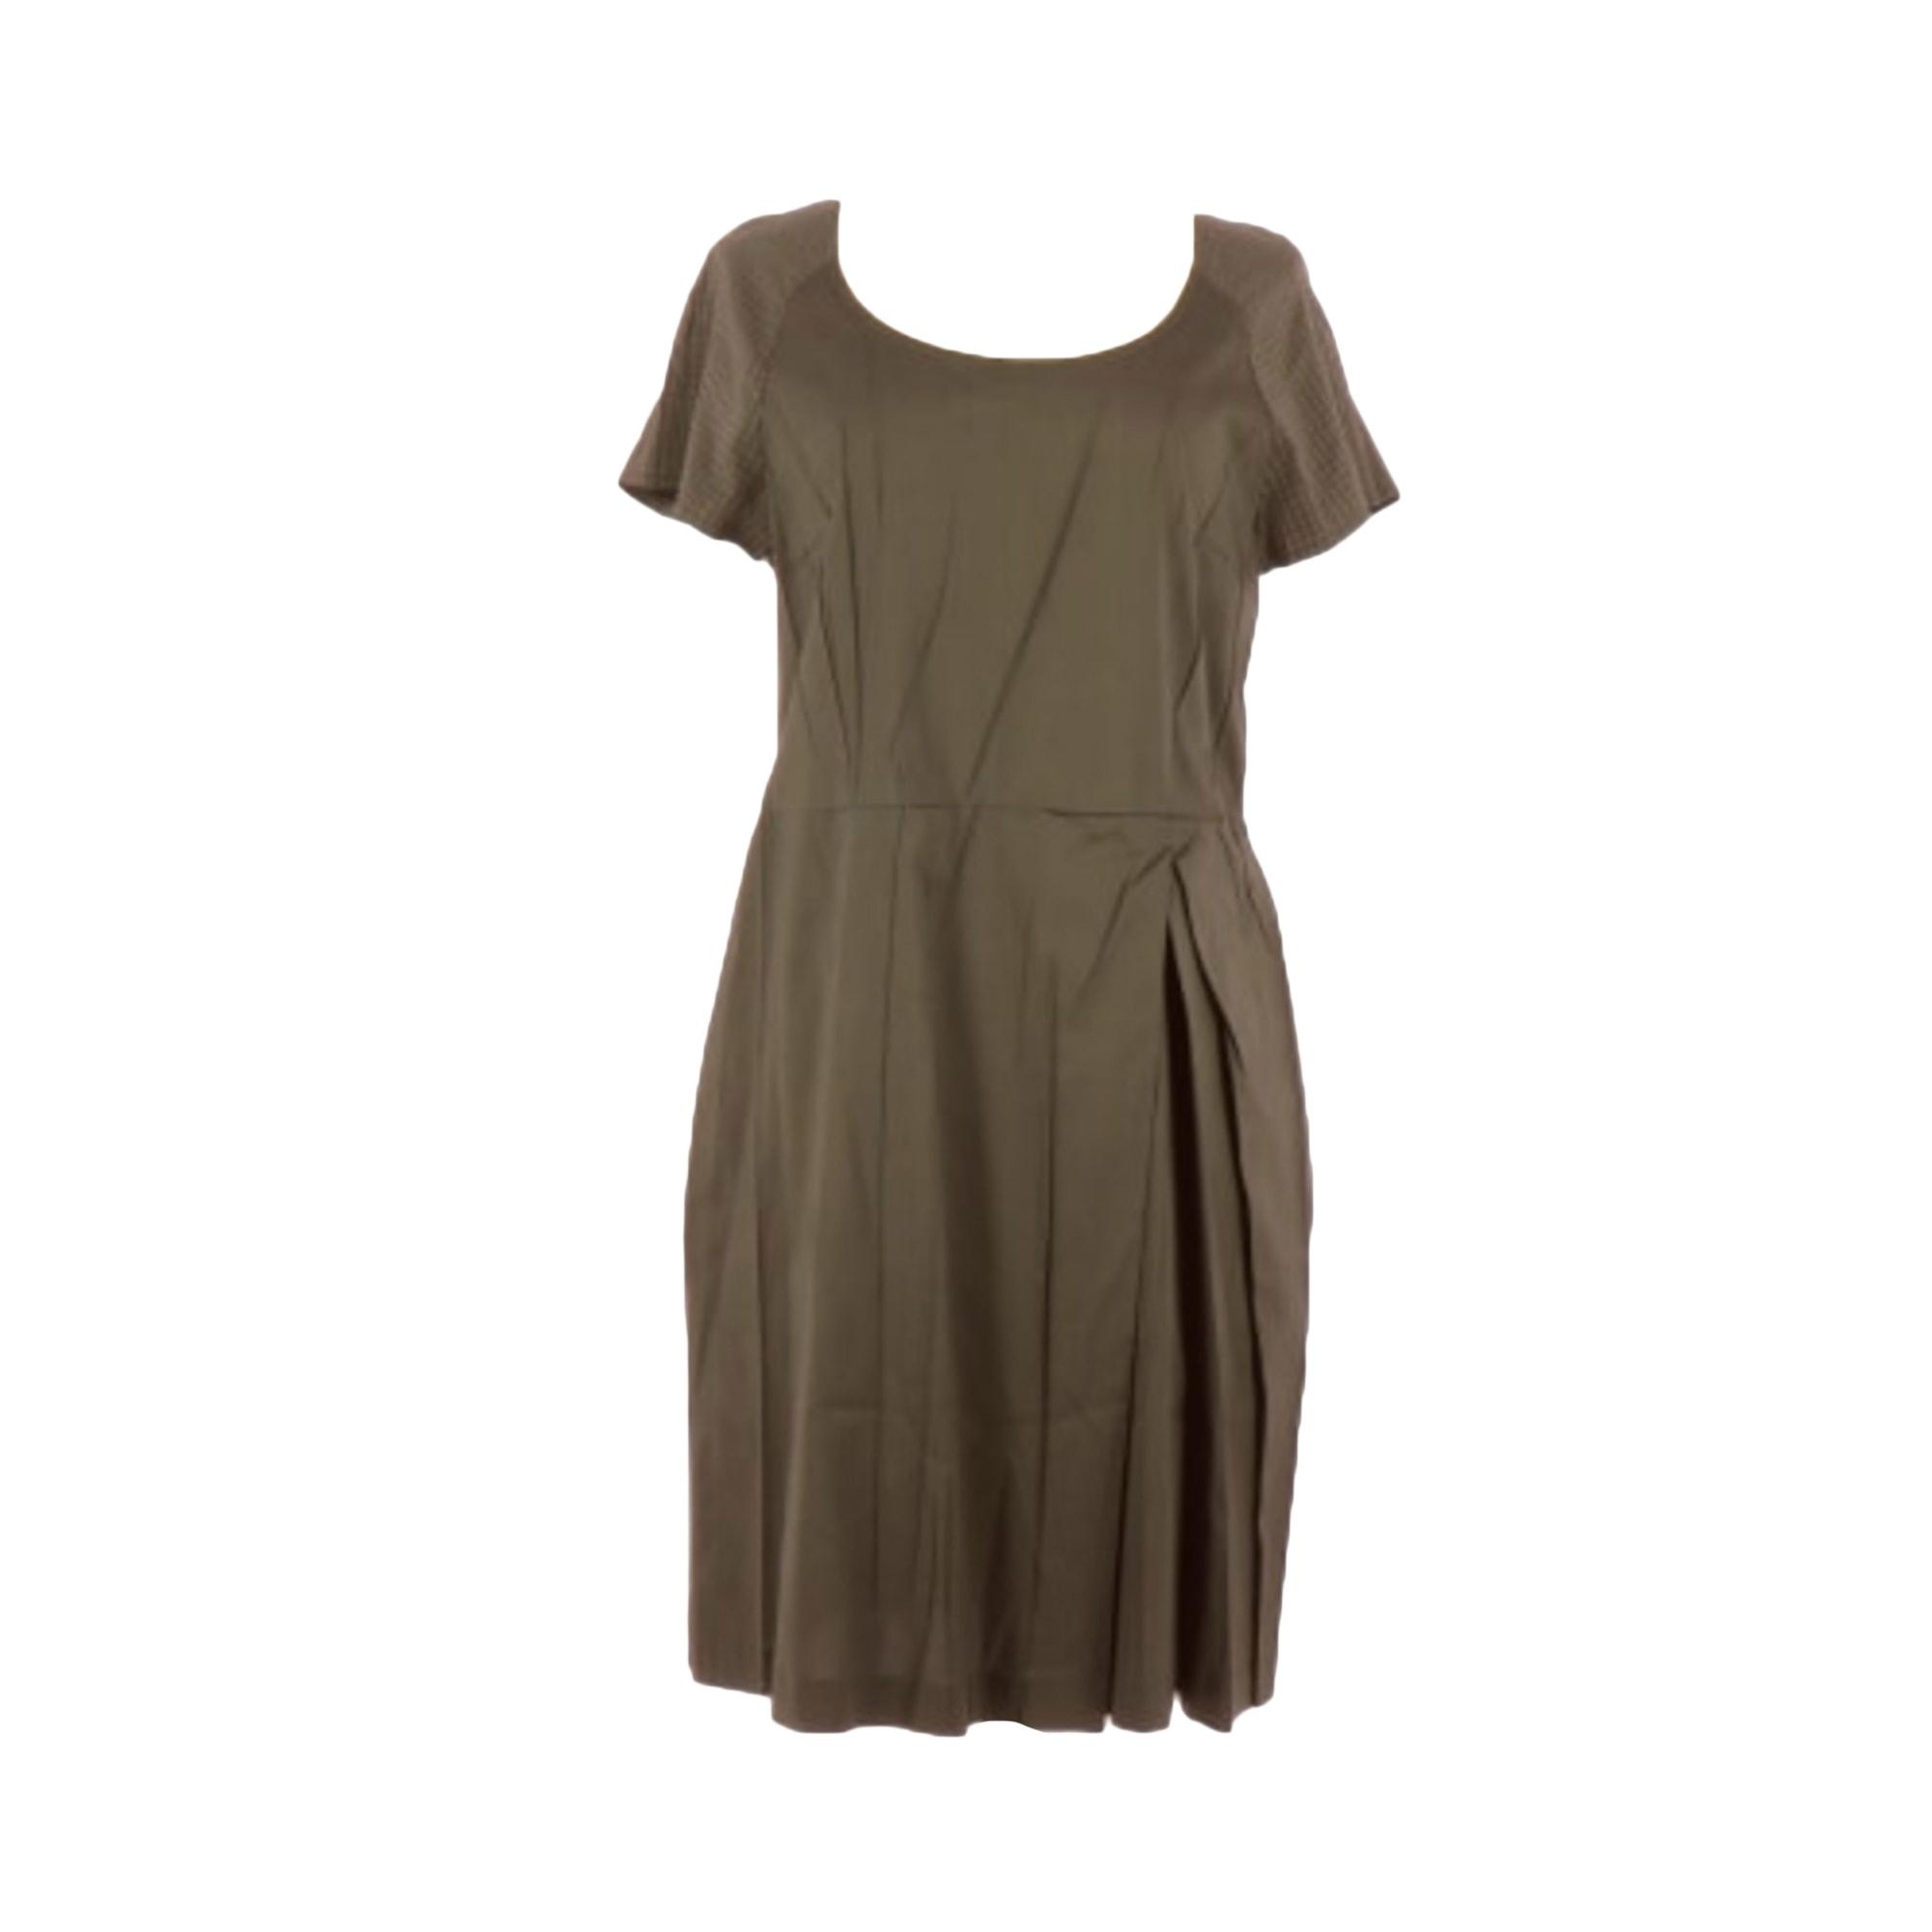 Mini Dress COTÉLAC Golden, bronze, copper